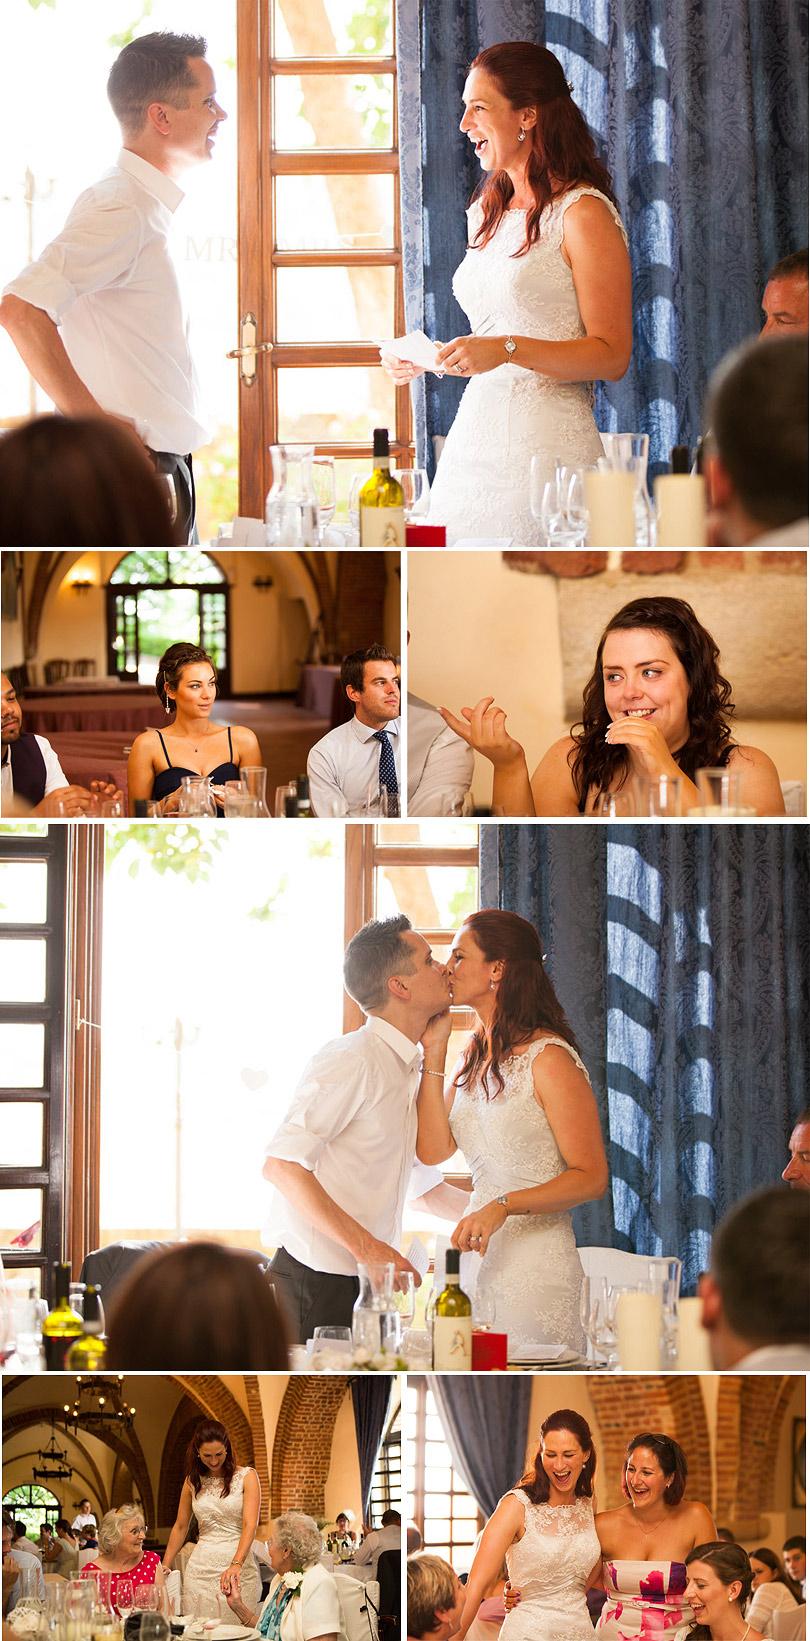 Castello-di-Cortanze-Italian-Wedding-LilyandFrankPhotography_29.jpg